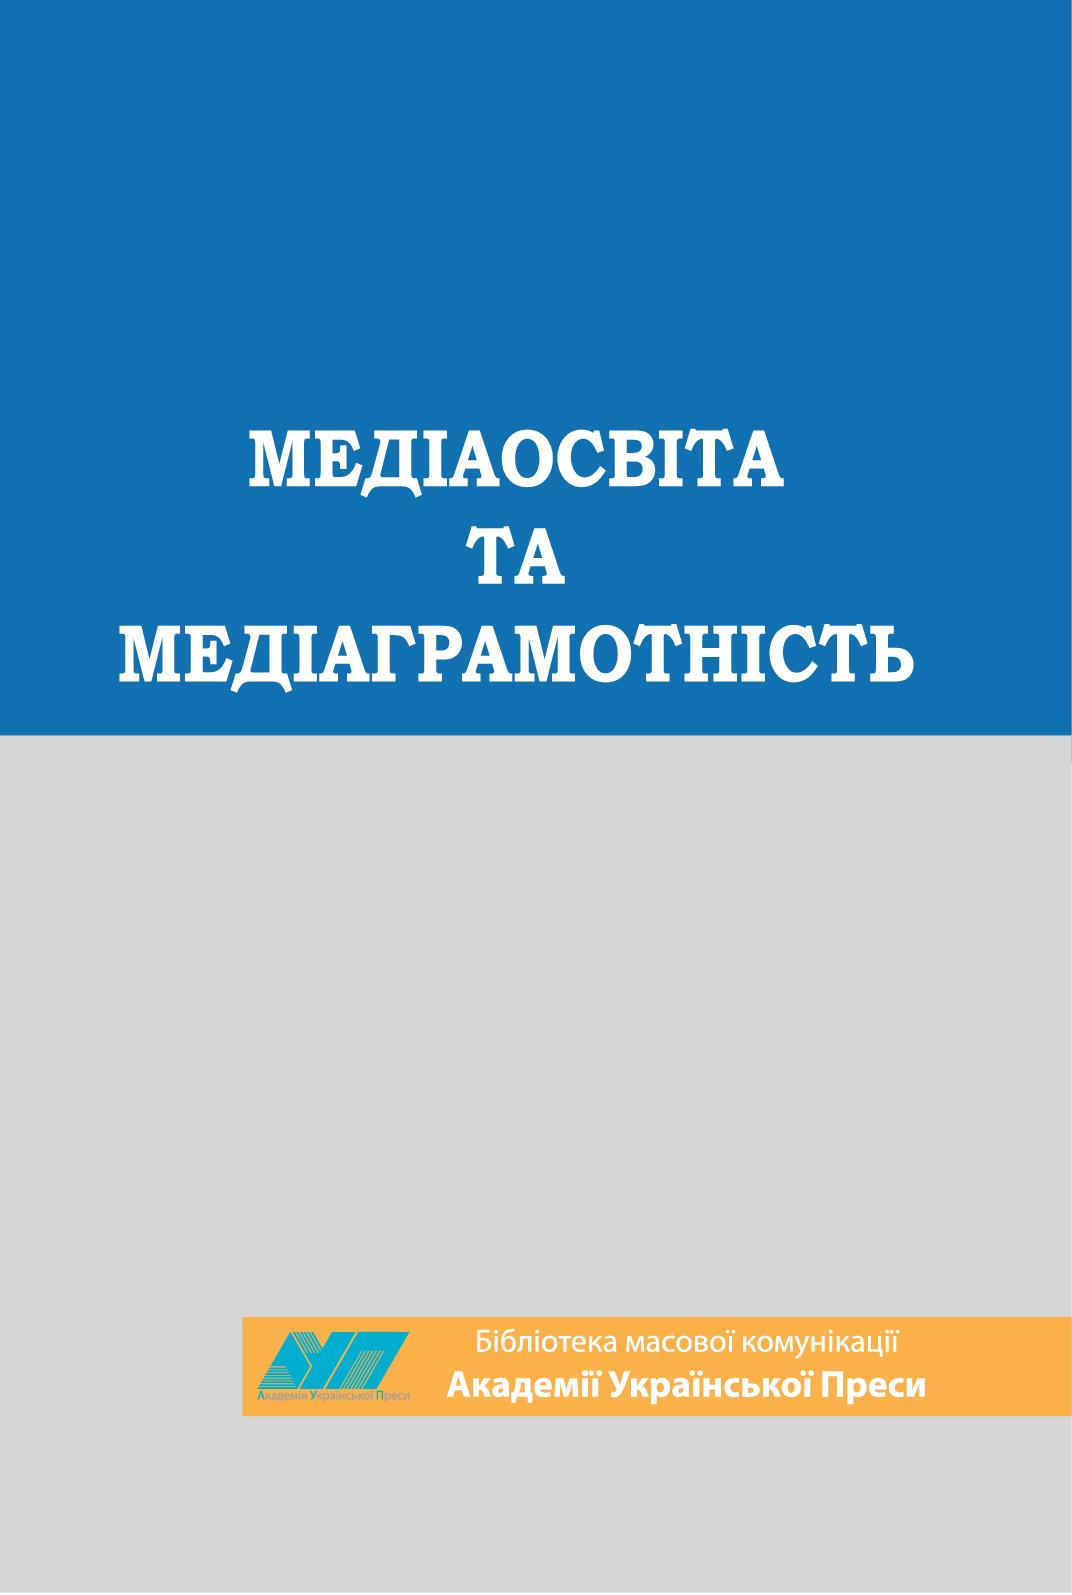 Calaméo - Mediapidruchnik 91c1782af03a7